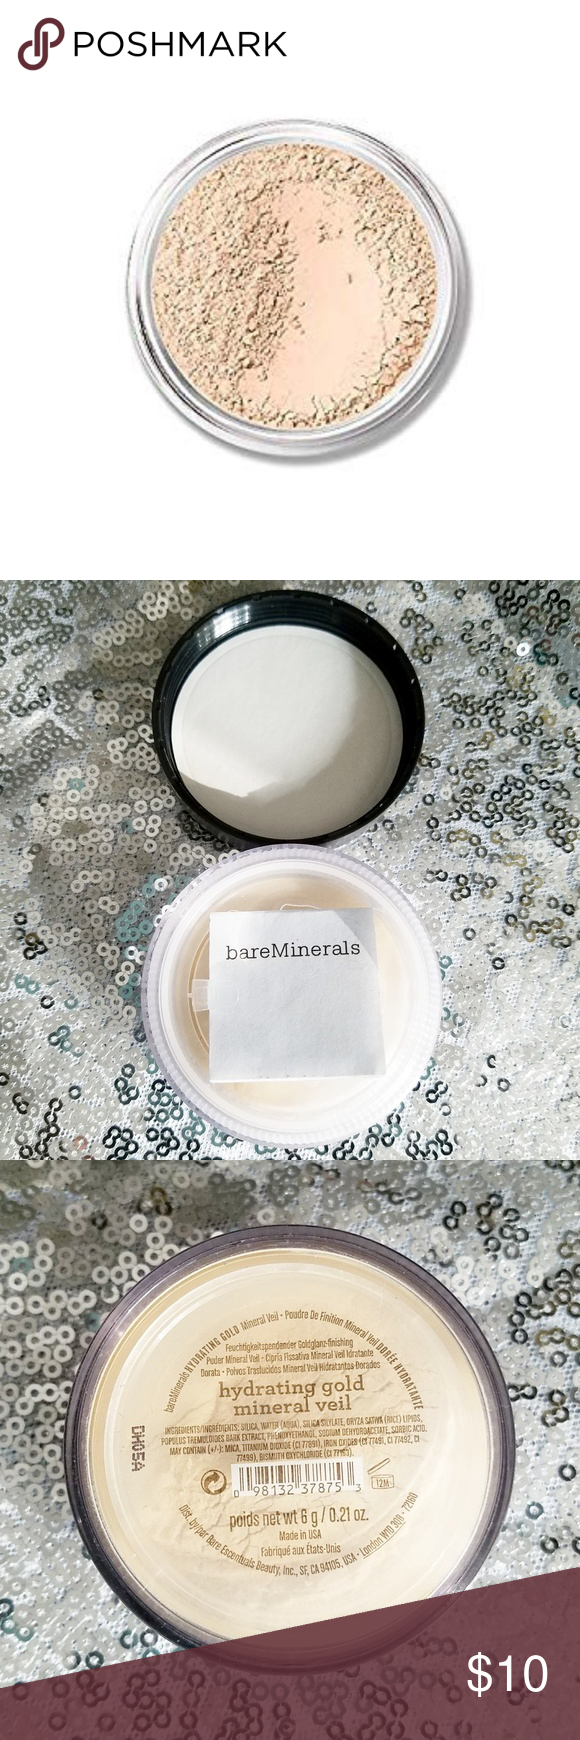 bareMinerals Hydrating Gold Mineral Veil Mineral veil